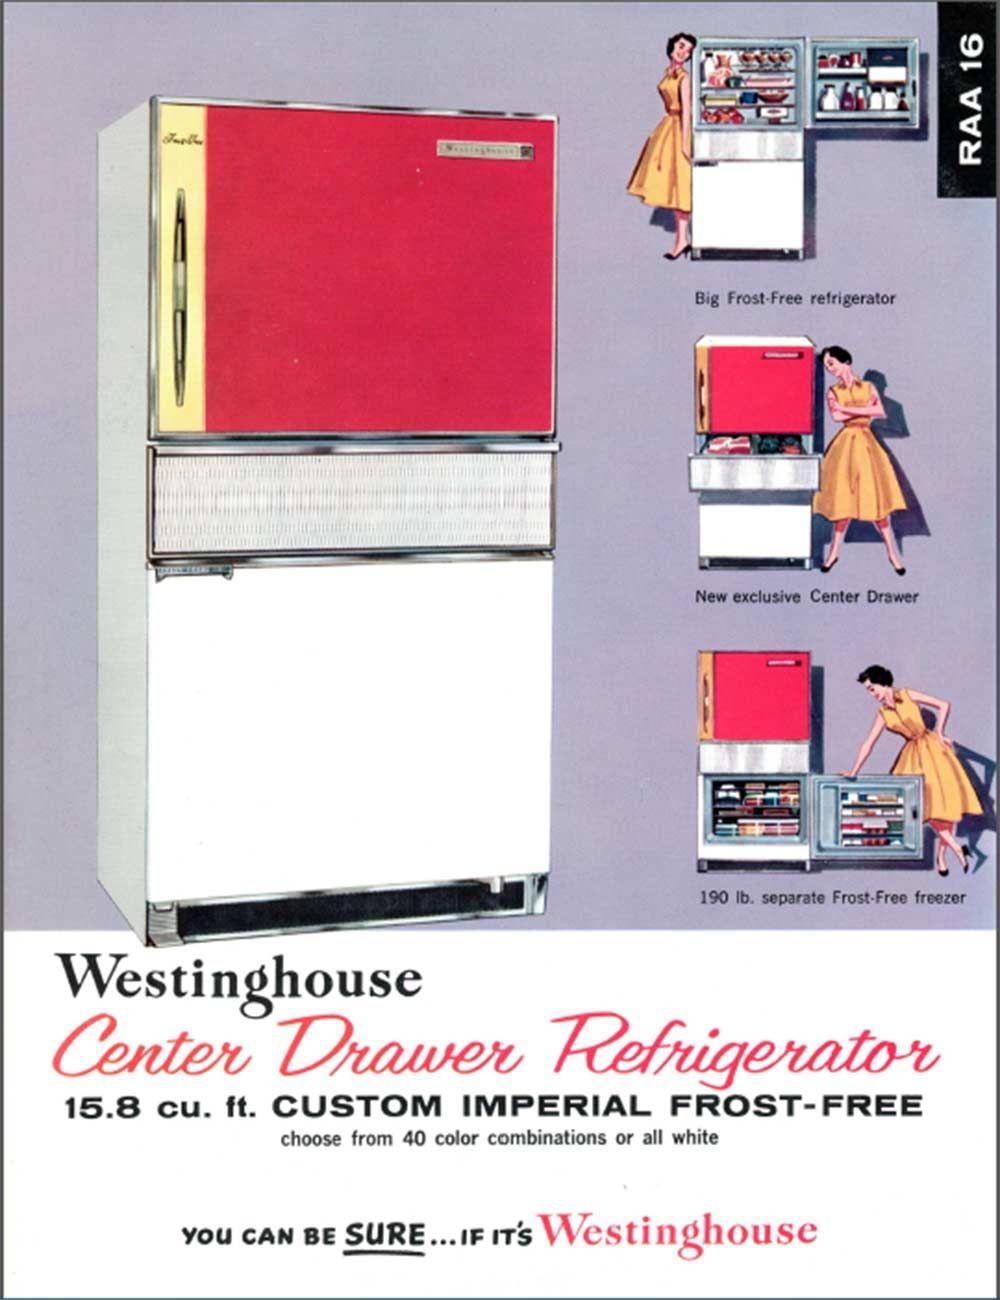 Peter Muller Munk S 1960 Westinghouse Refrigerator Design Wanted